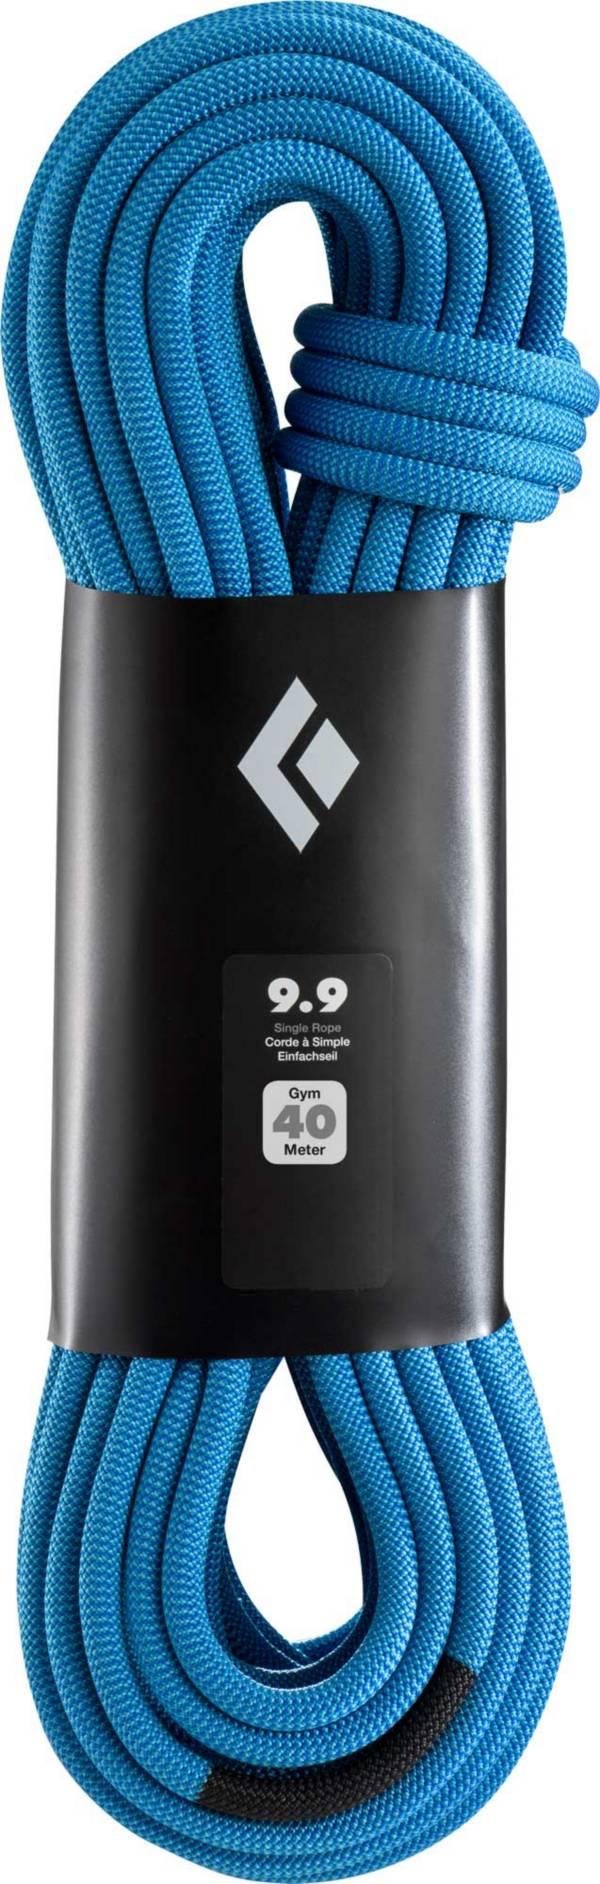 Black Diamond 9.9 Gym Rope 40 Meters product image